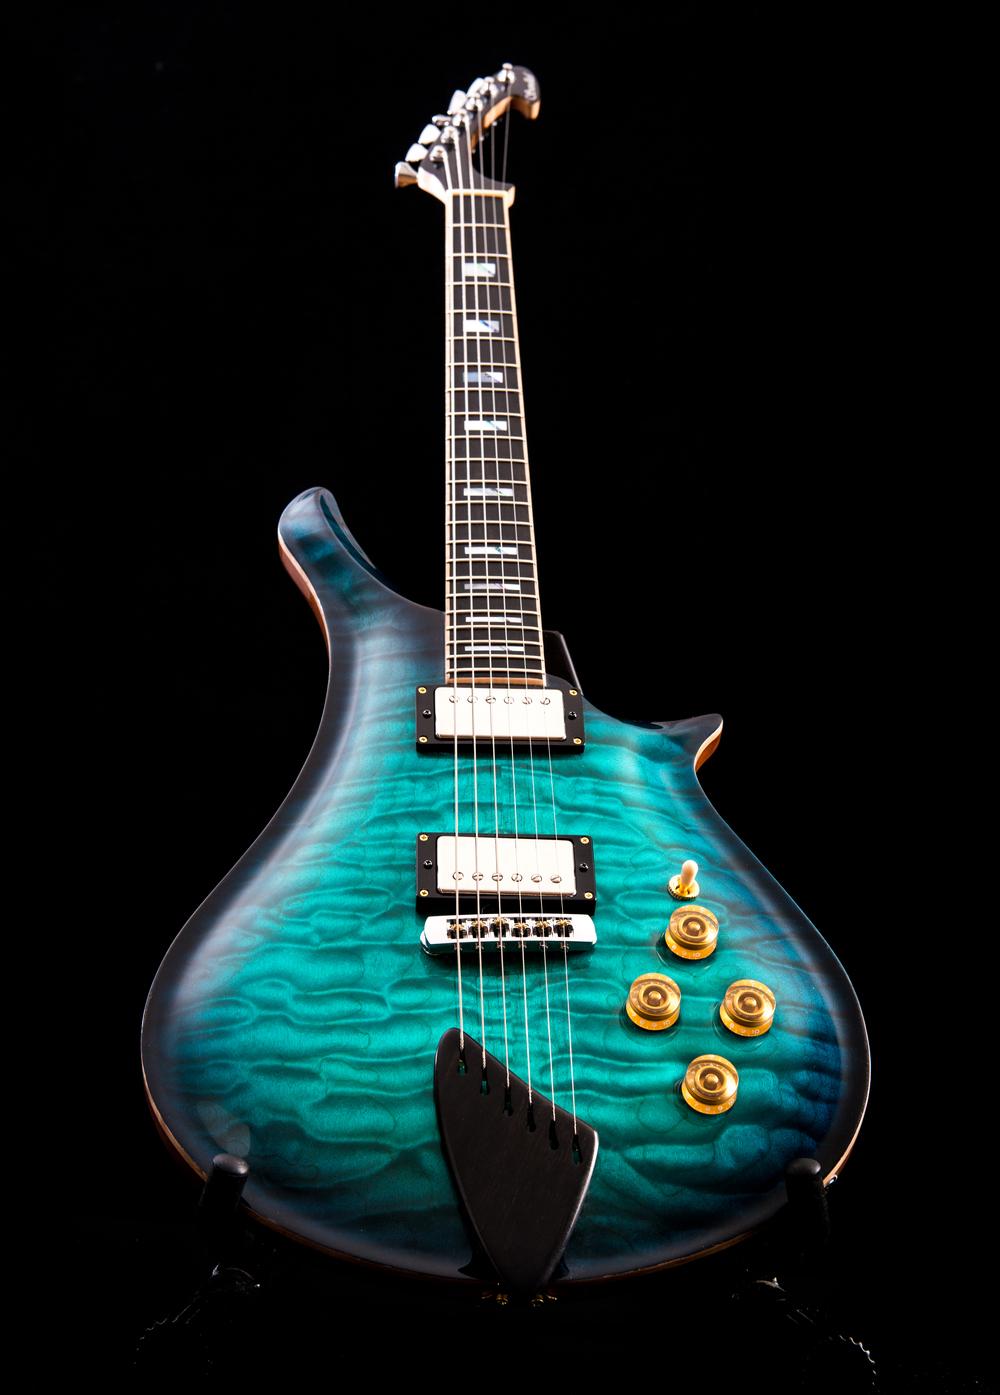 2013-03-18-guitar-042.jpg